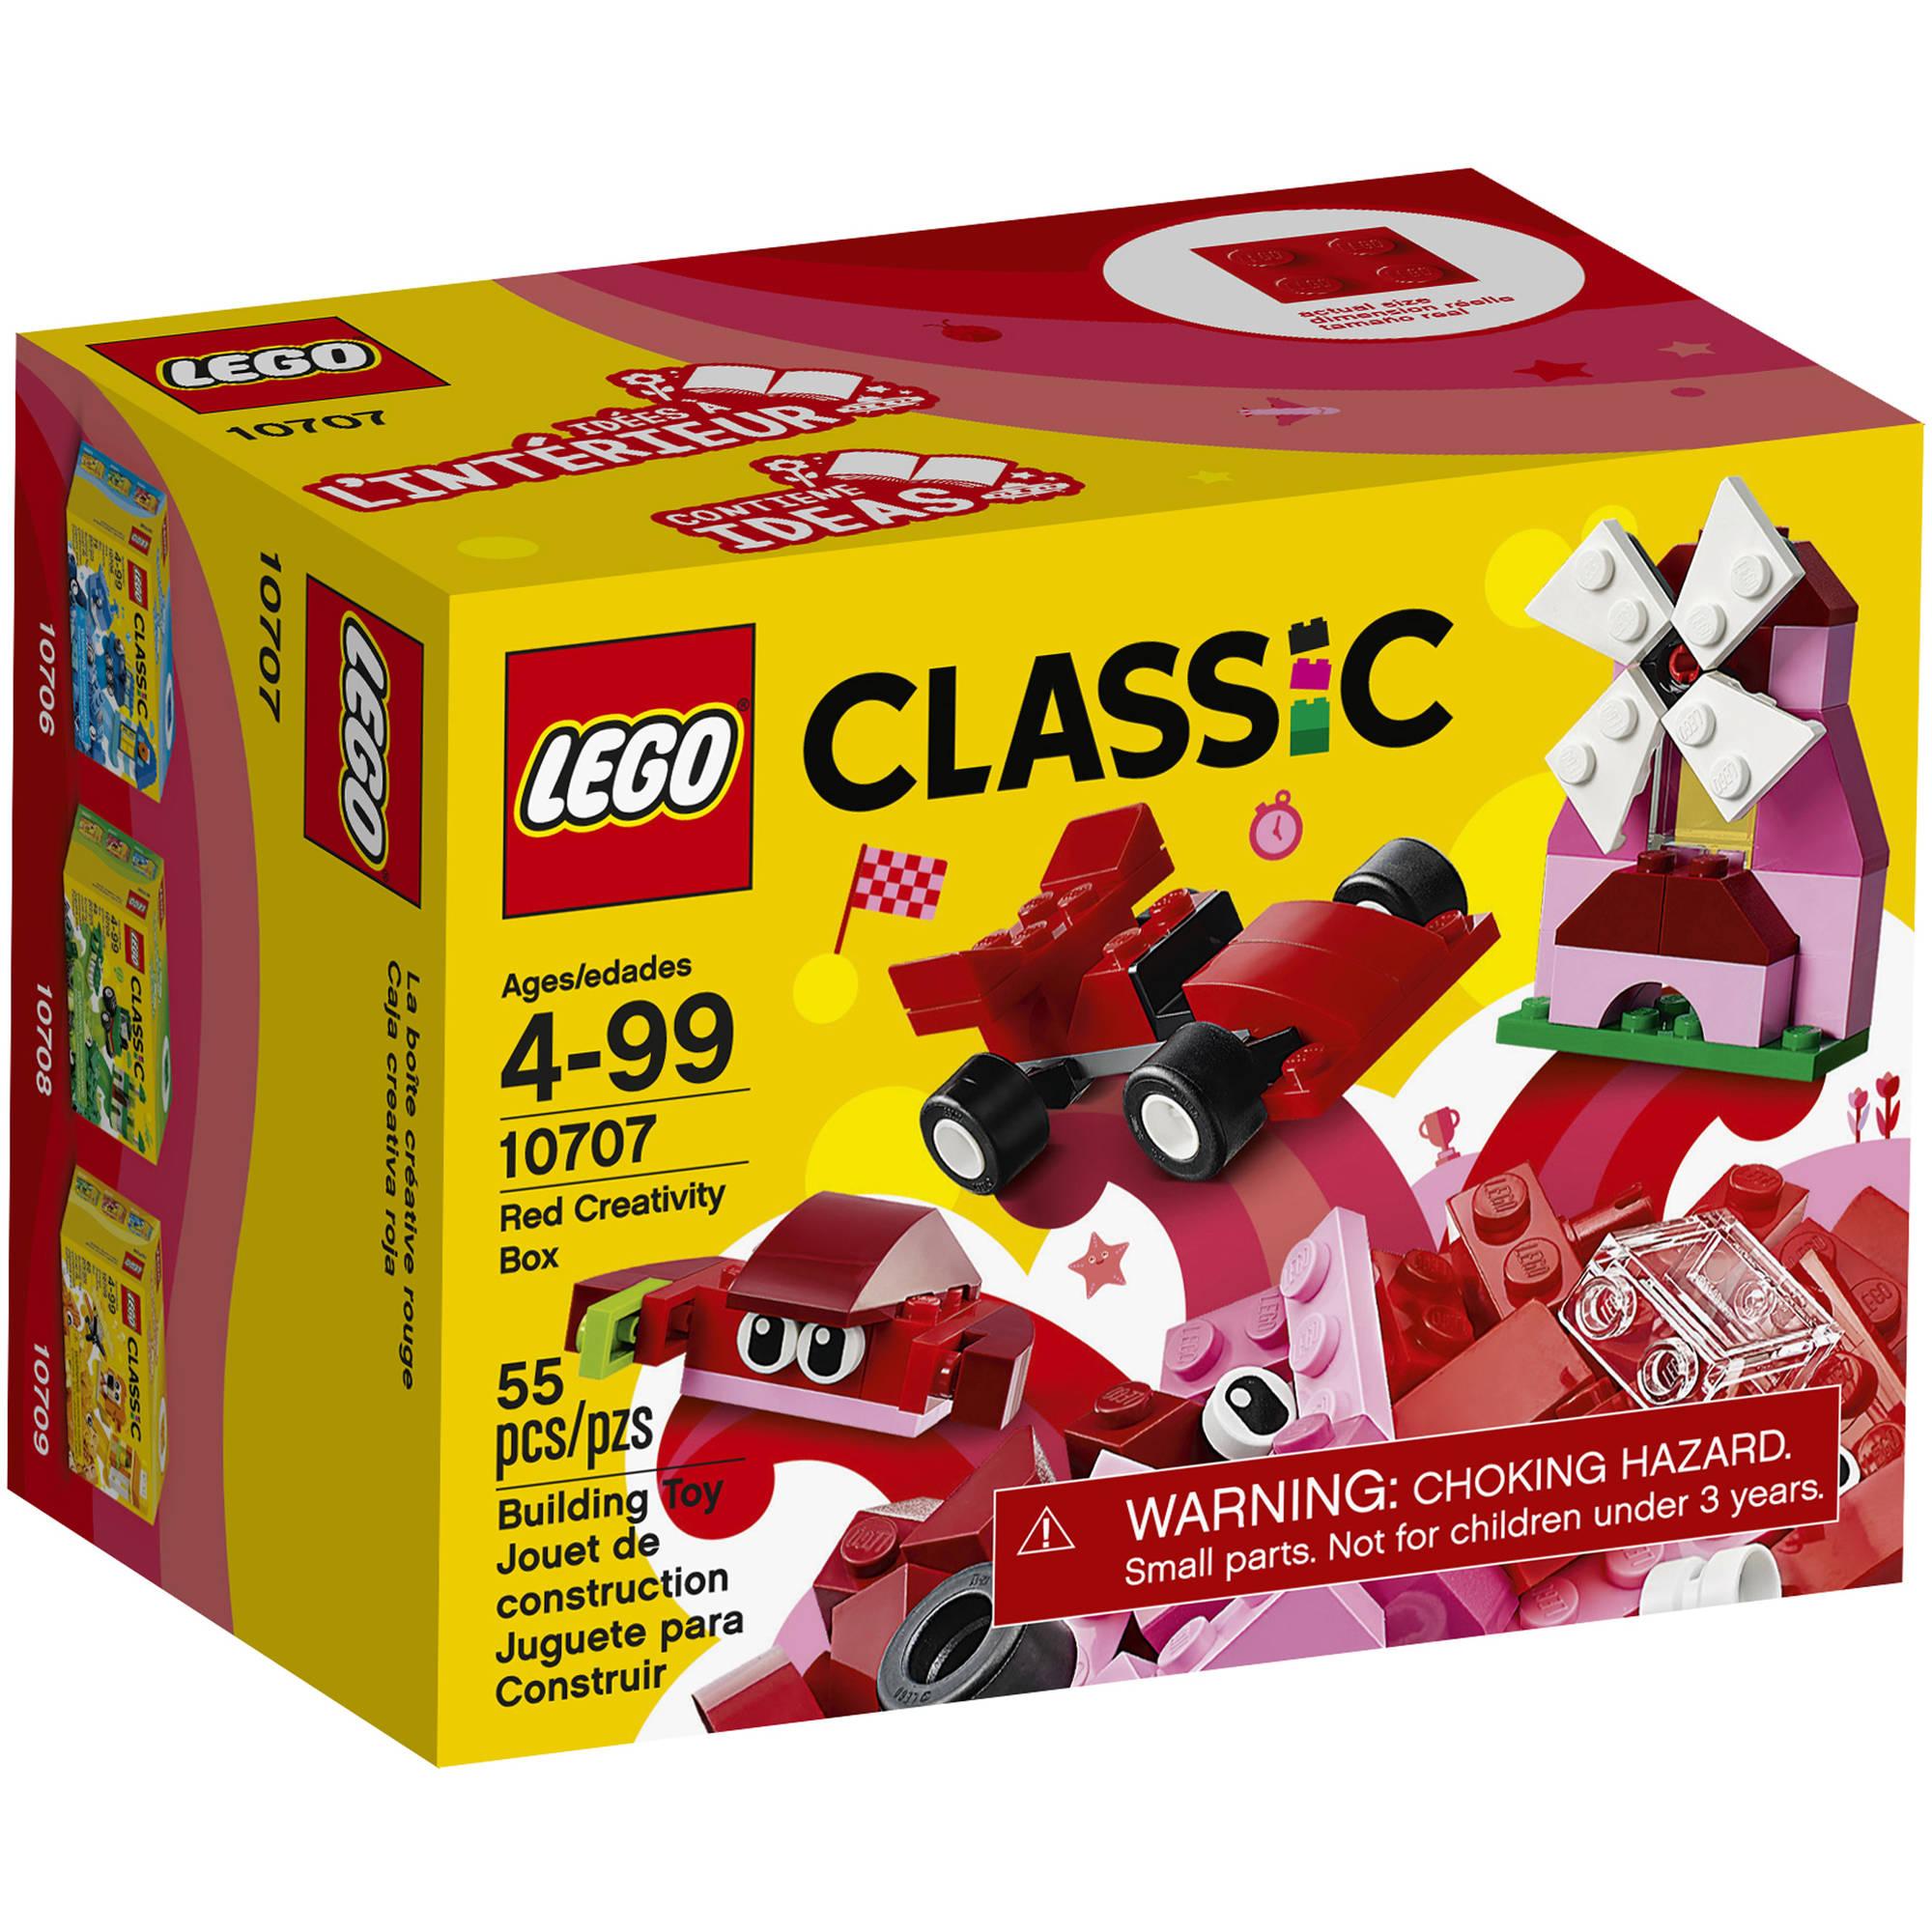 LEGO Classic Creativity Box, Red 10707 (55 Pieces)